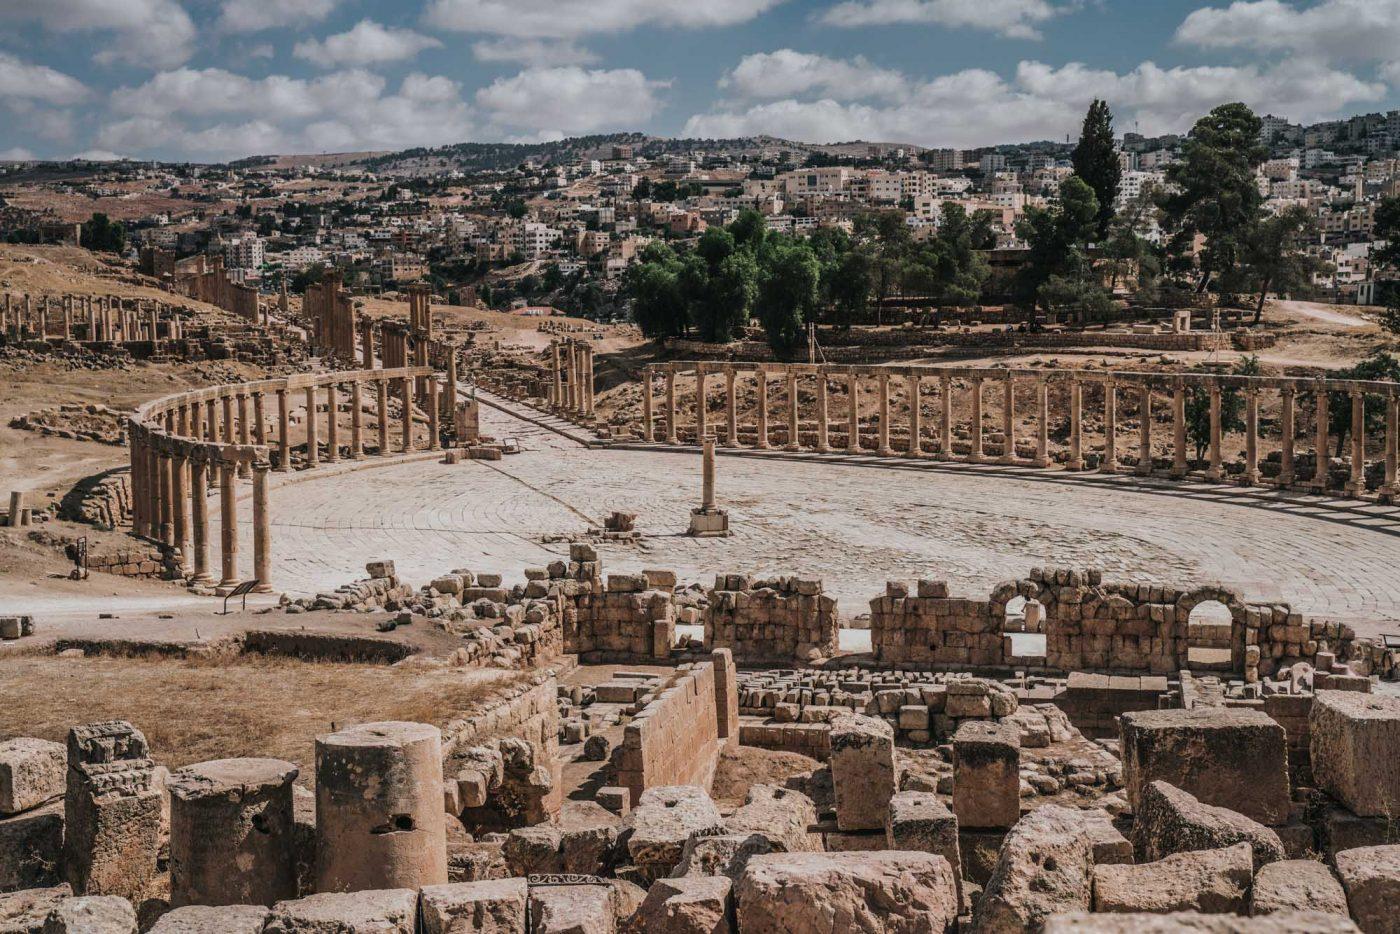 Things to do in Jordan: Hippodromein the ancient city of Jerash, Jordan